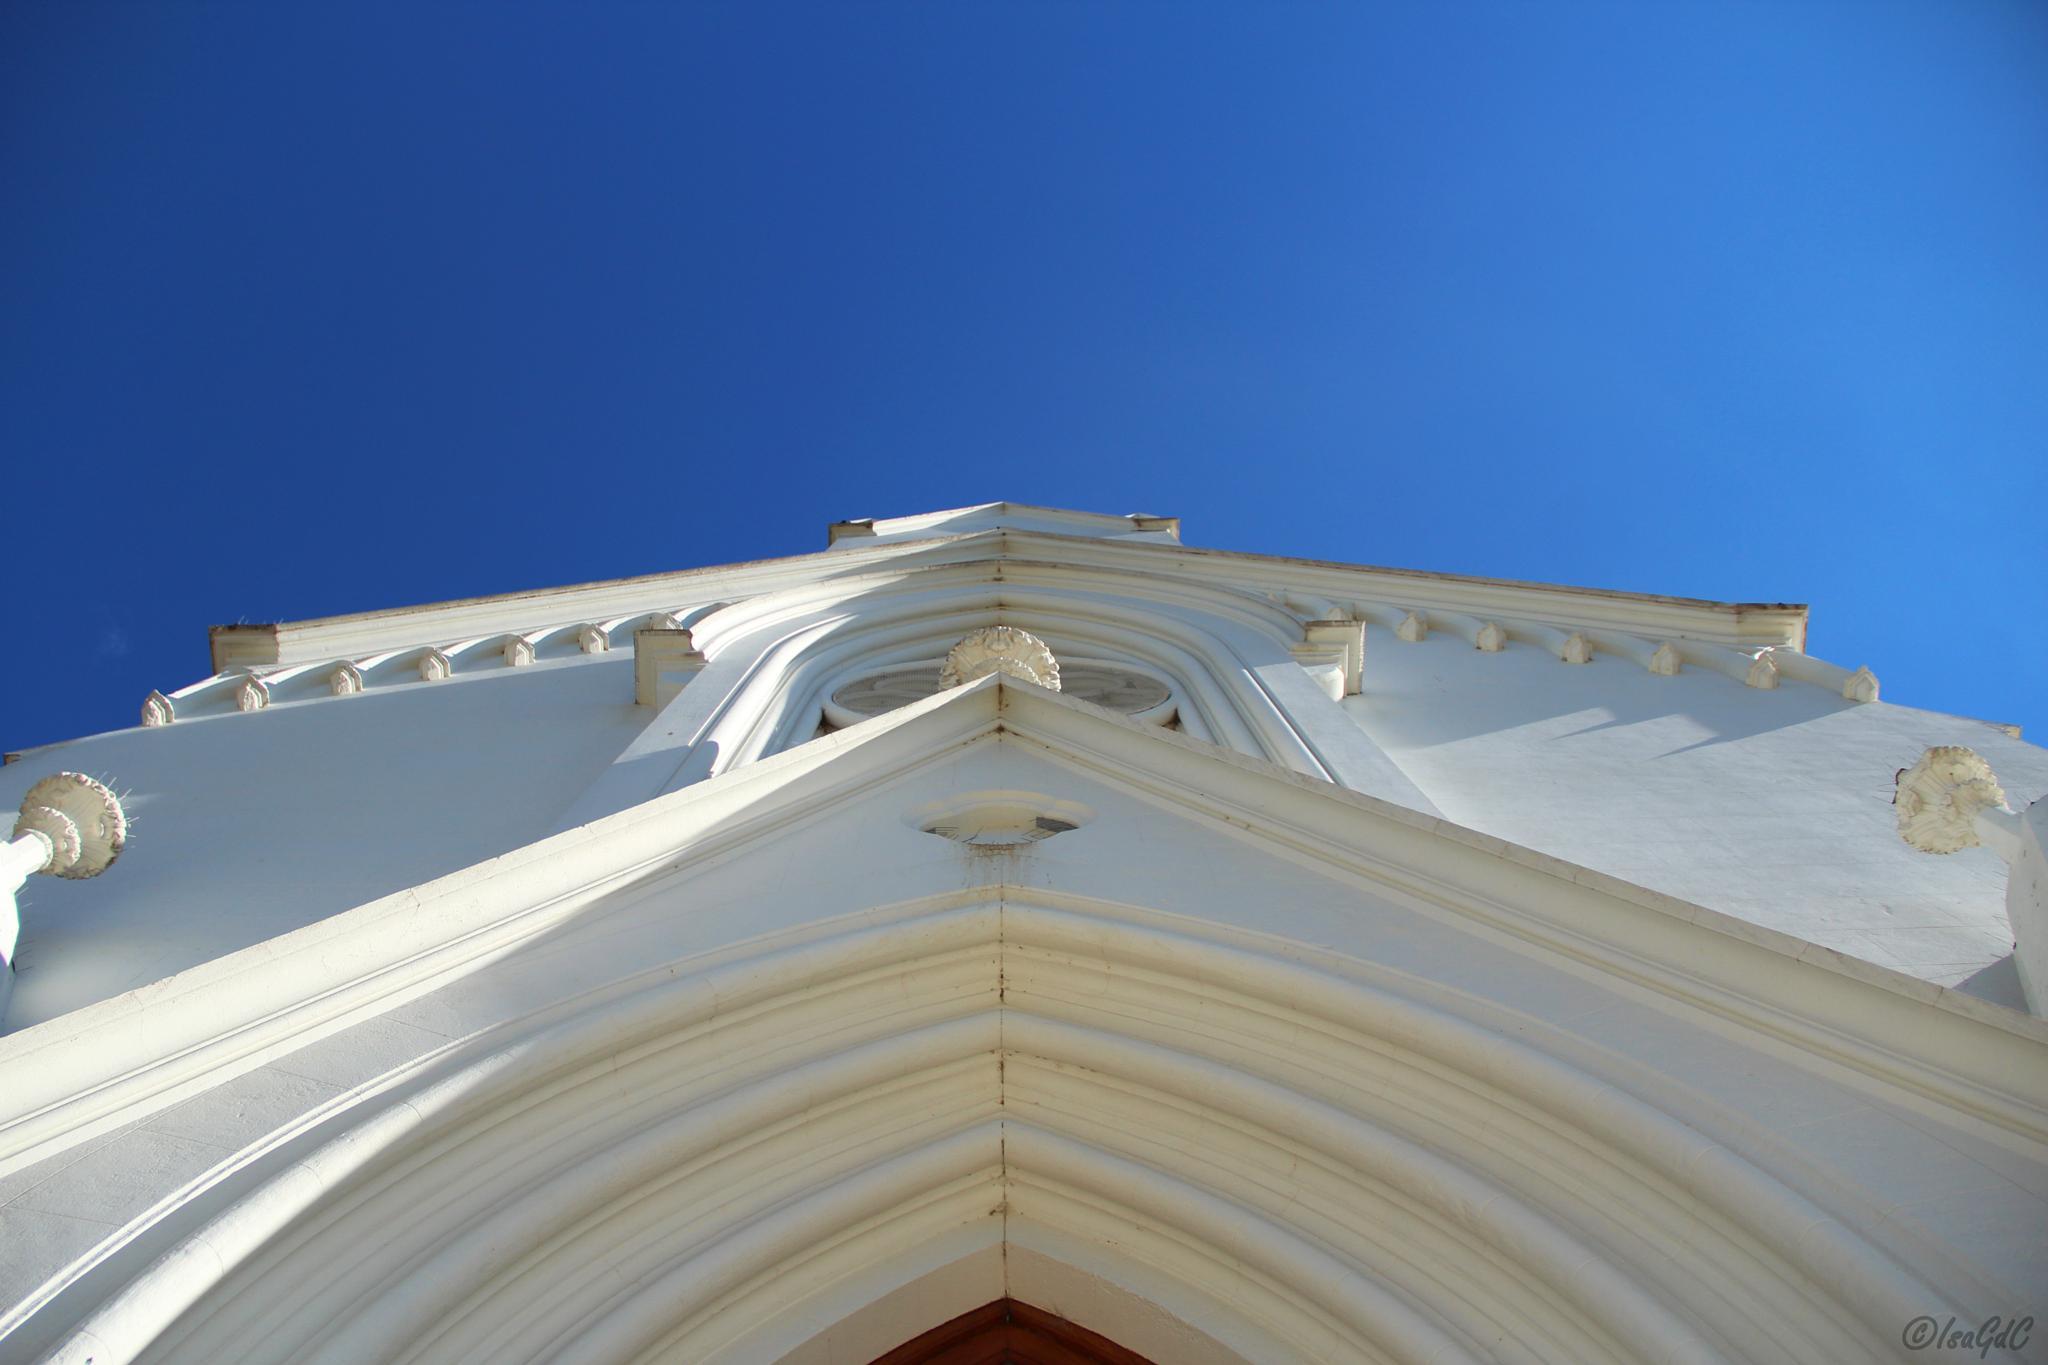 Blanco celestial by IsaGdC